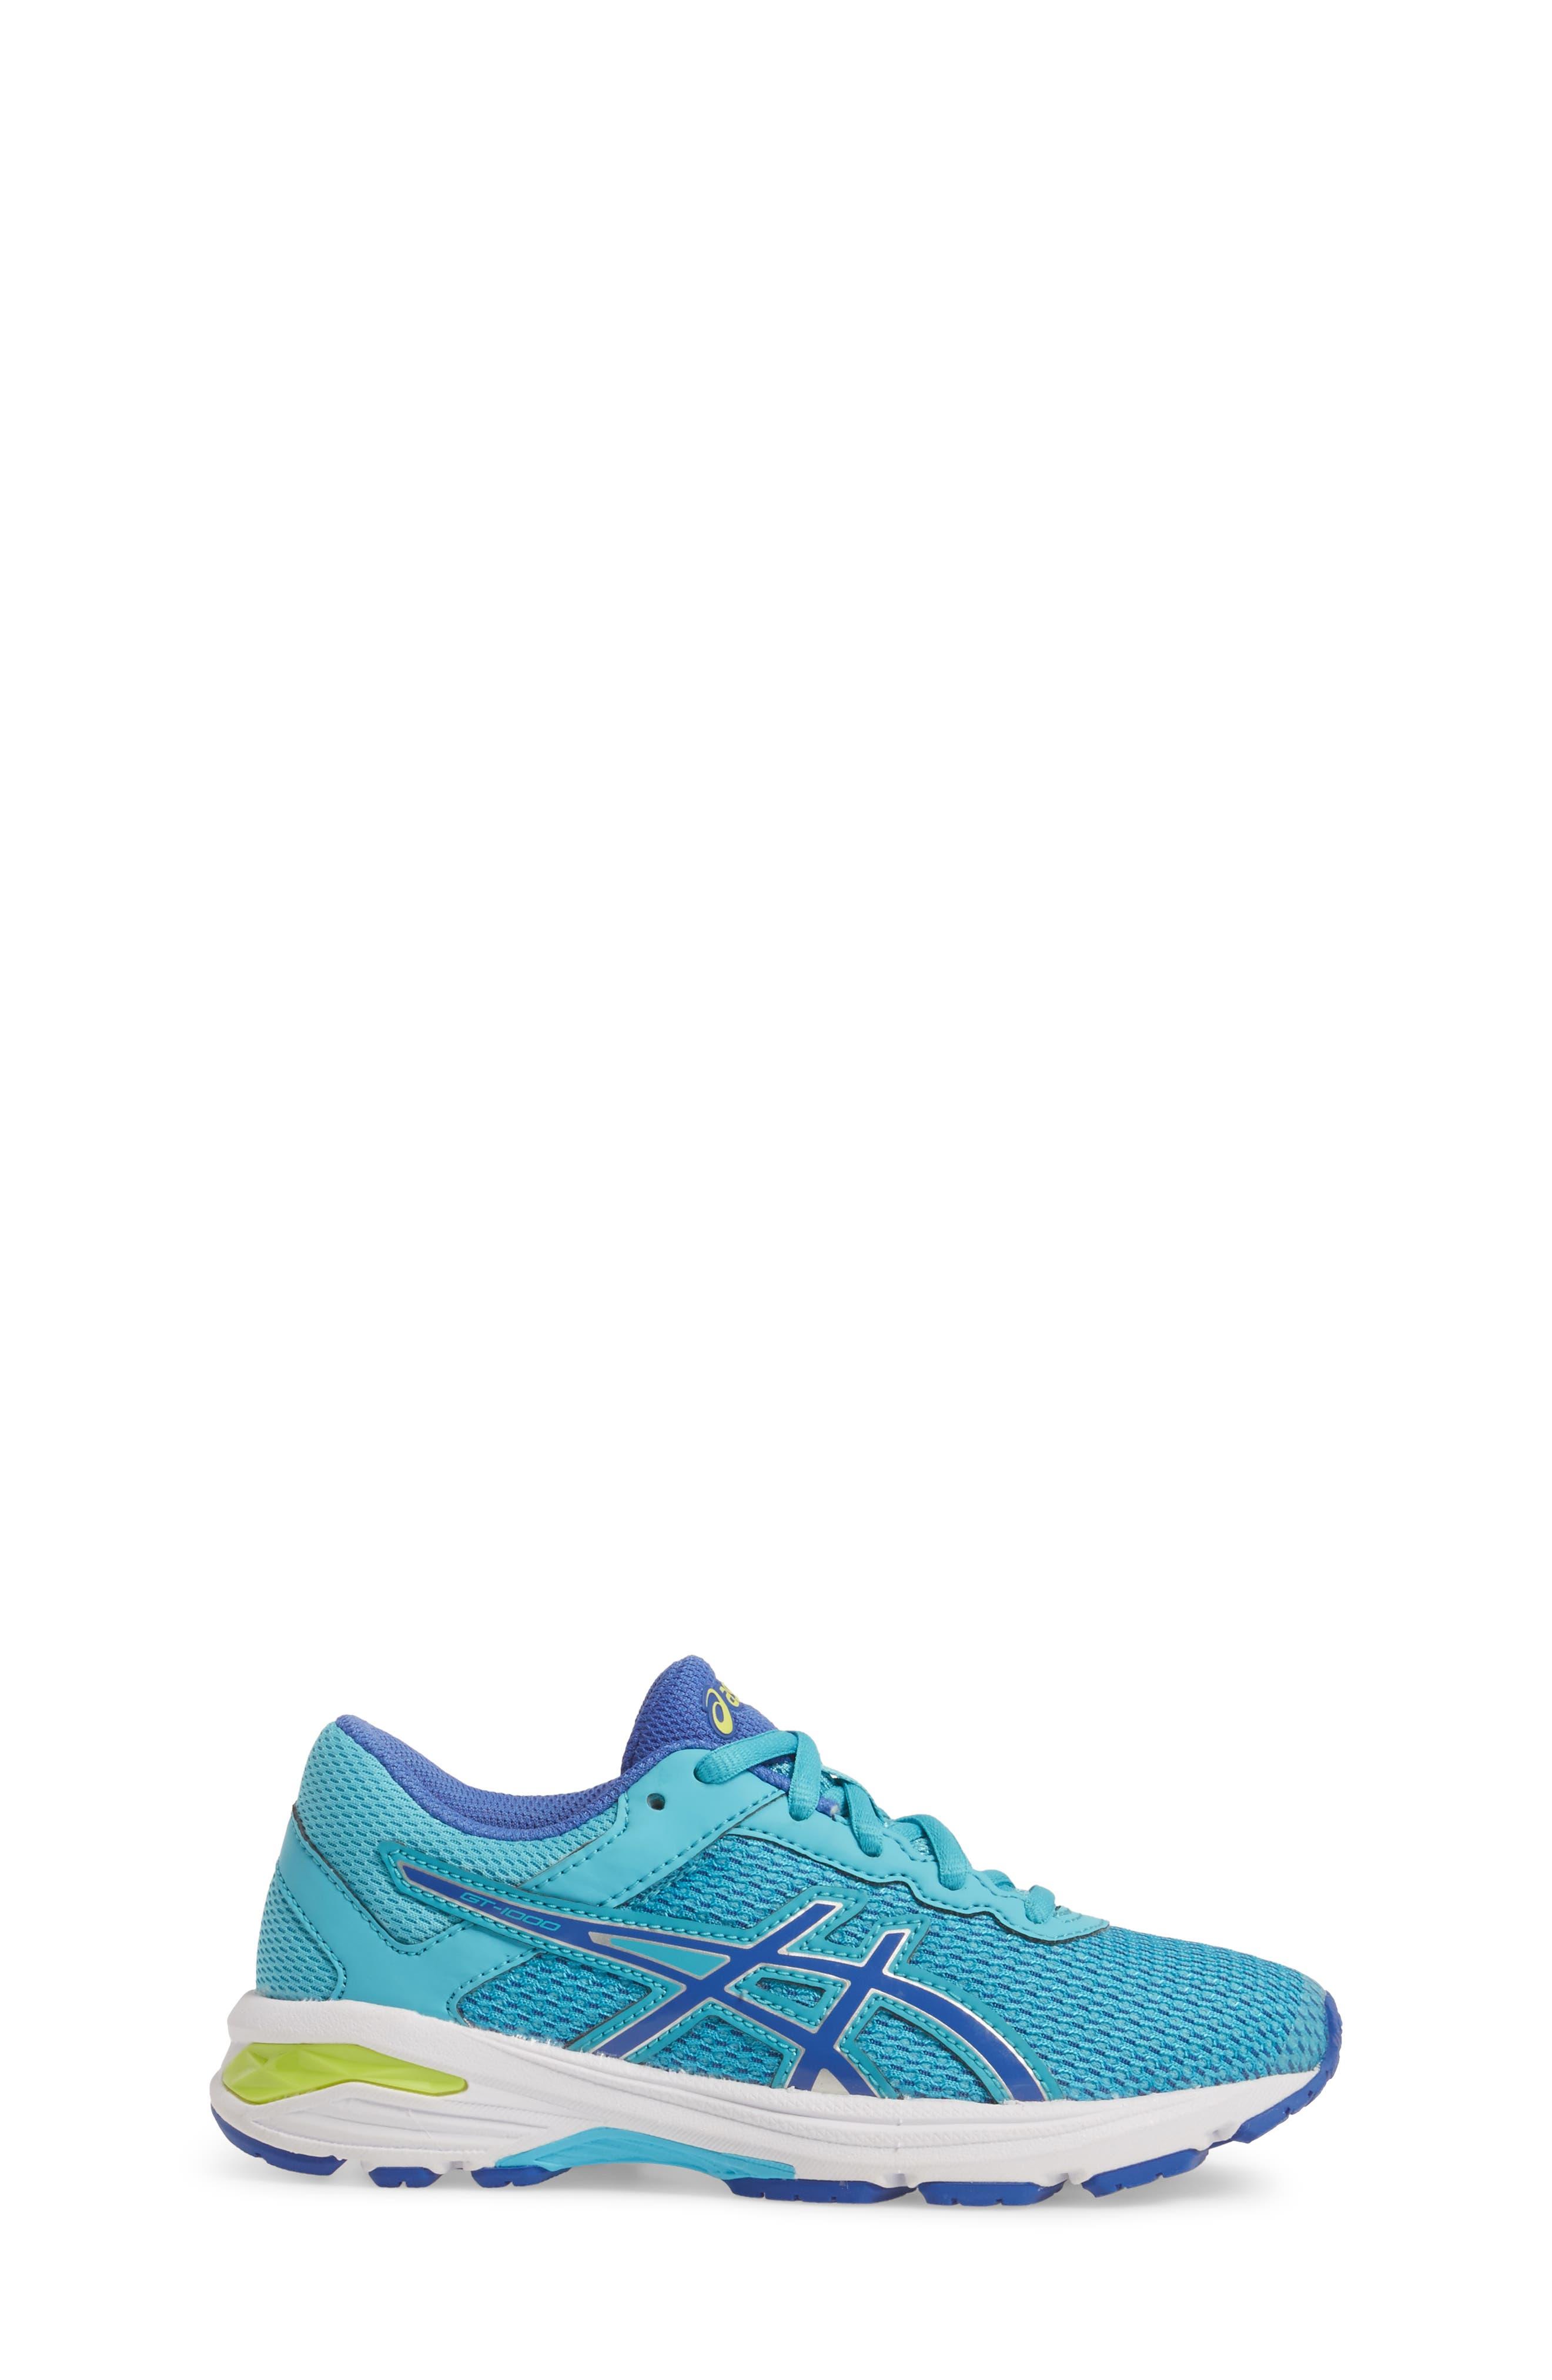 Asics GT-1000<sup>™</sup> 6 GS Sneaker,                             Alternate thumbnail 12, color,